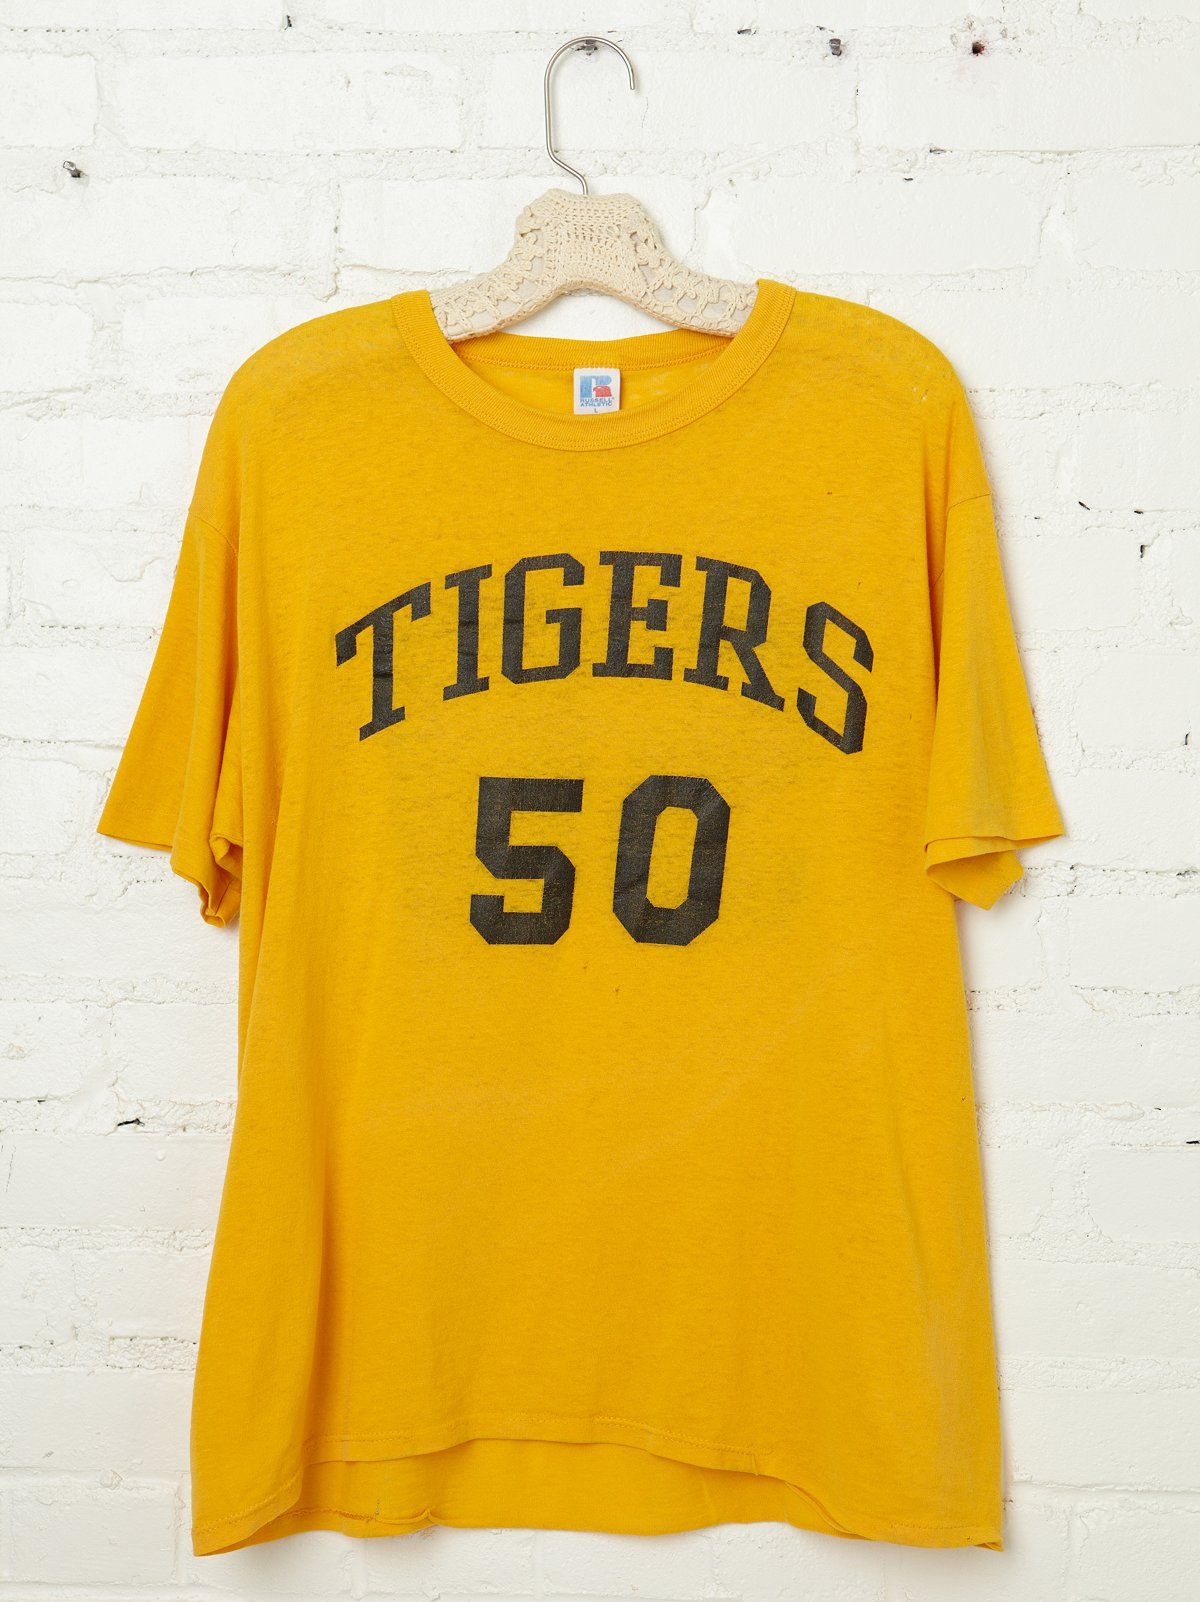 Vintage Tigers Tee